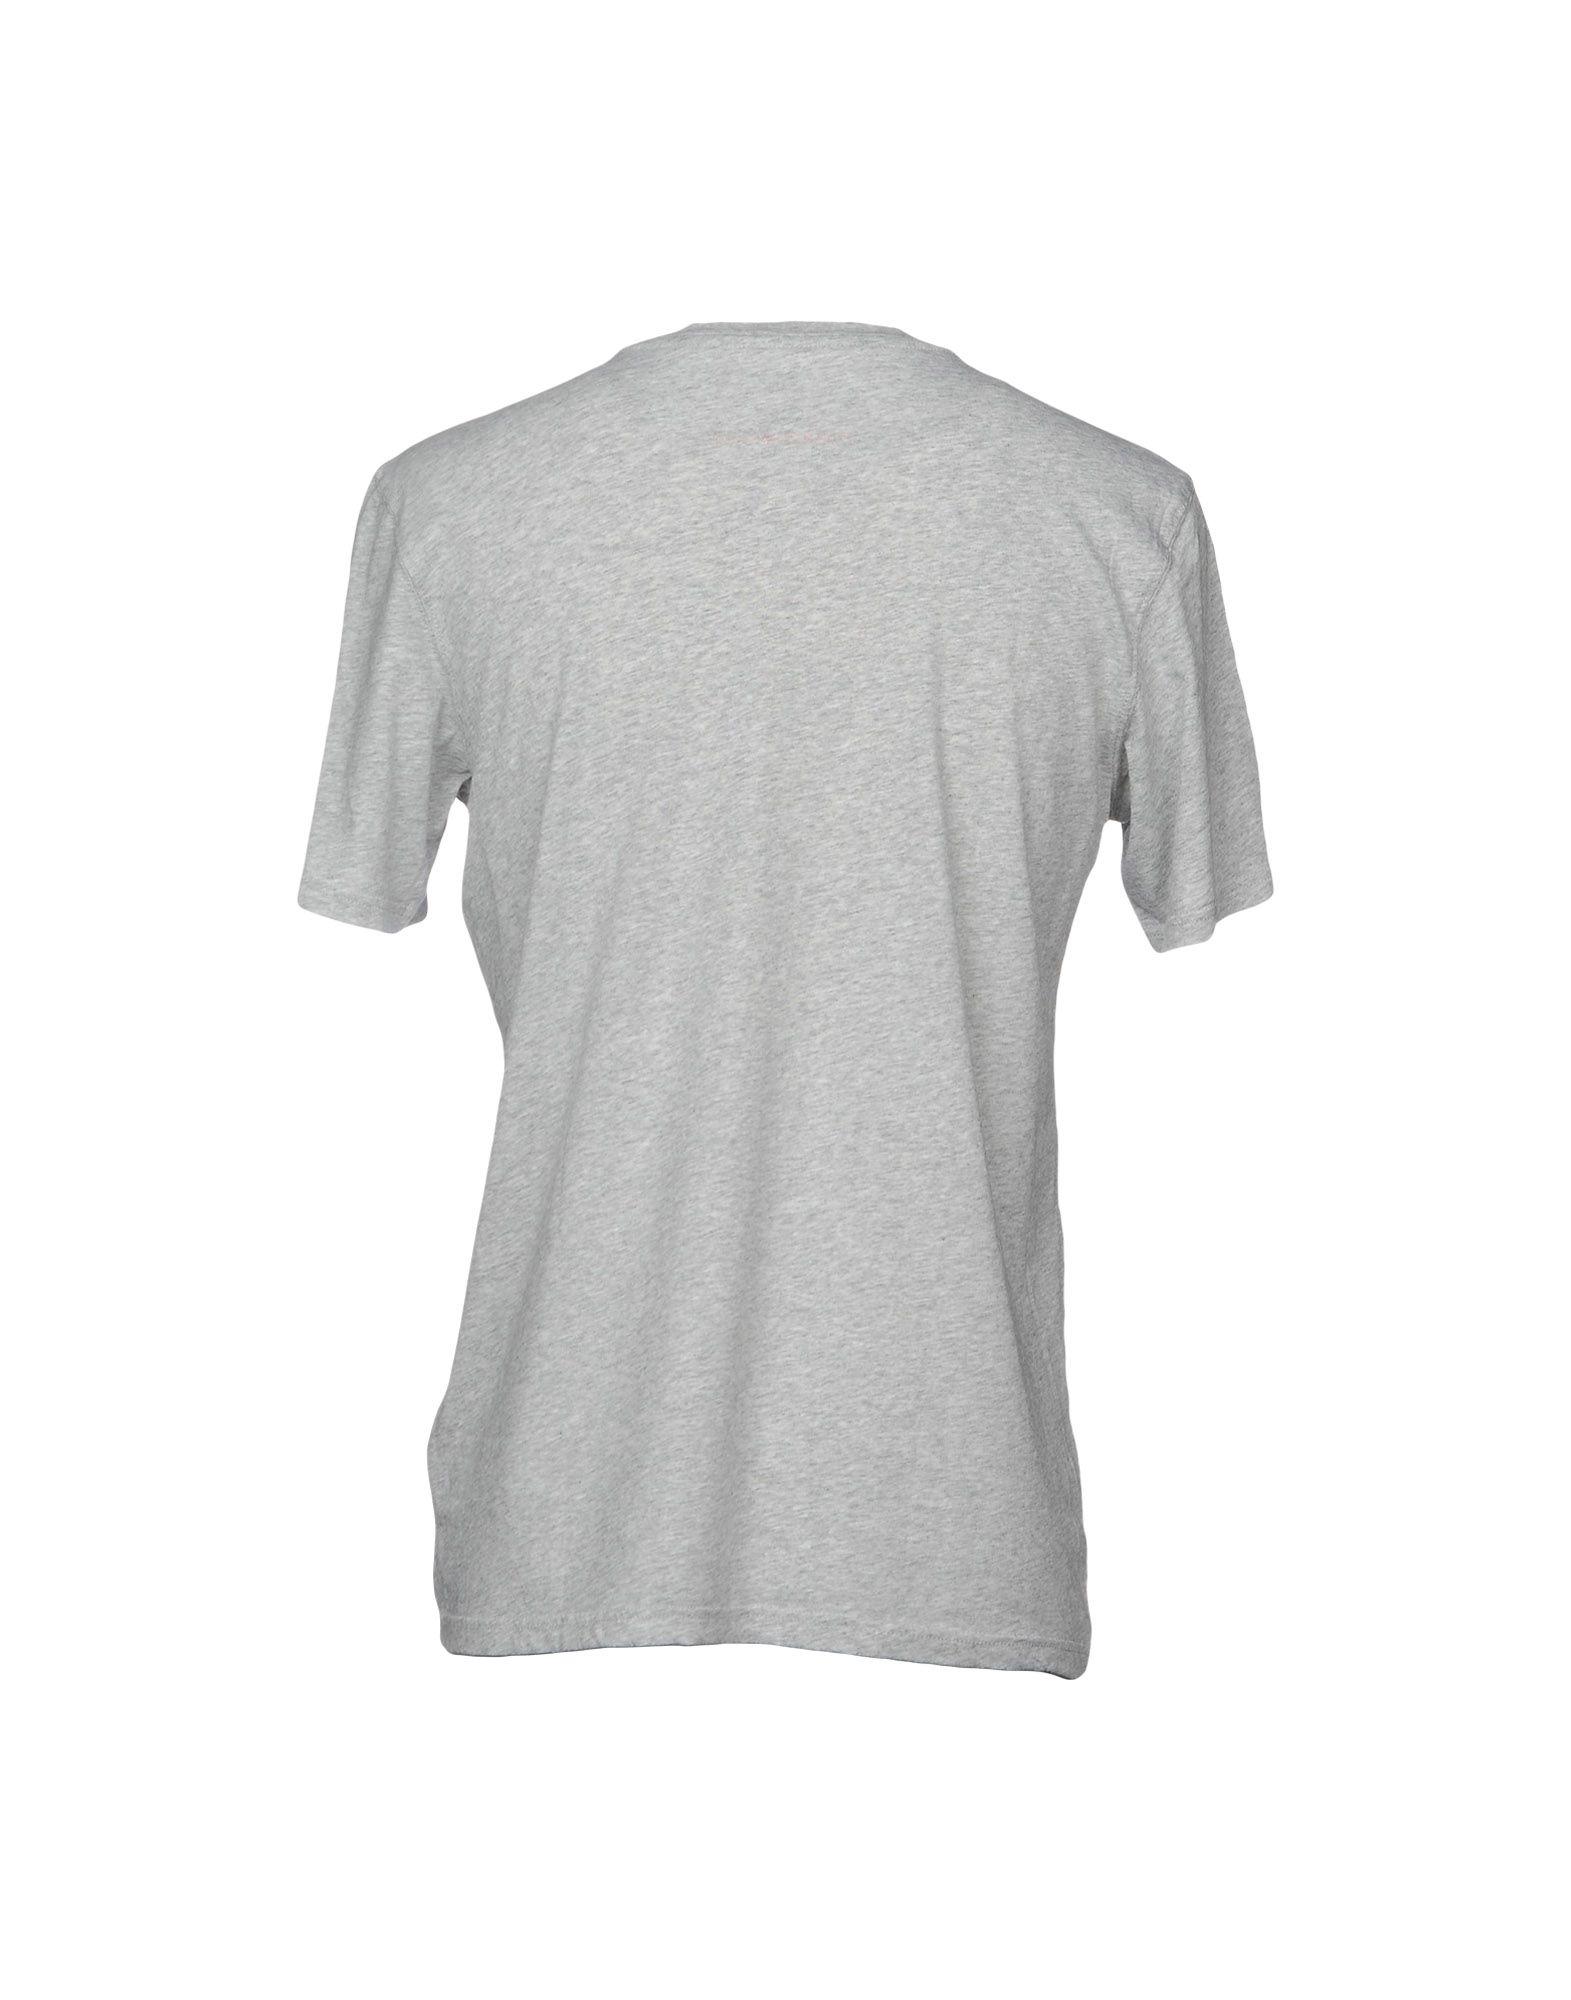 A A buon mercato A A buon mercato T-Shirt Parajumpers Uomo - 12105107KB 592ad8